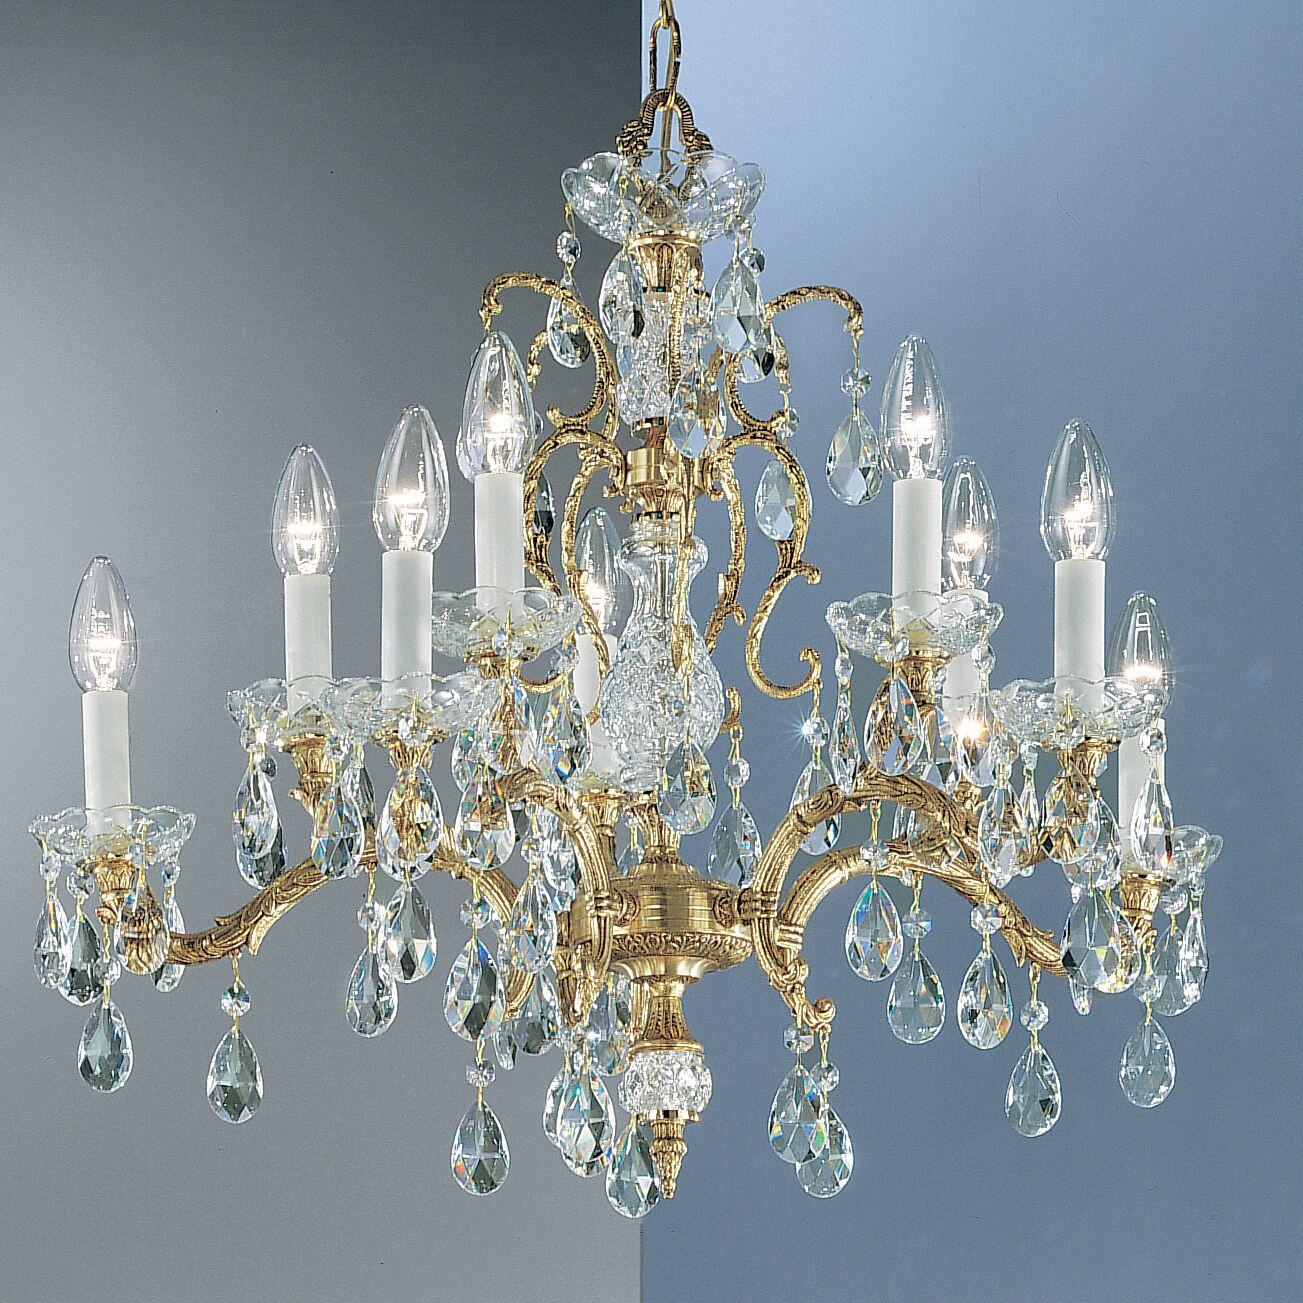 Madrid 10-Light Candle Style Chandelier Finish: Olde World Bronze, Crystal Type: Prisms Amber